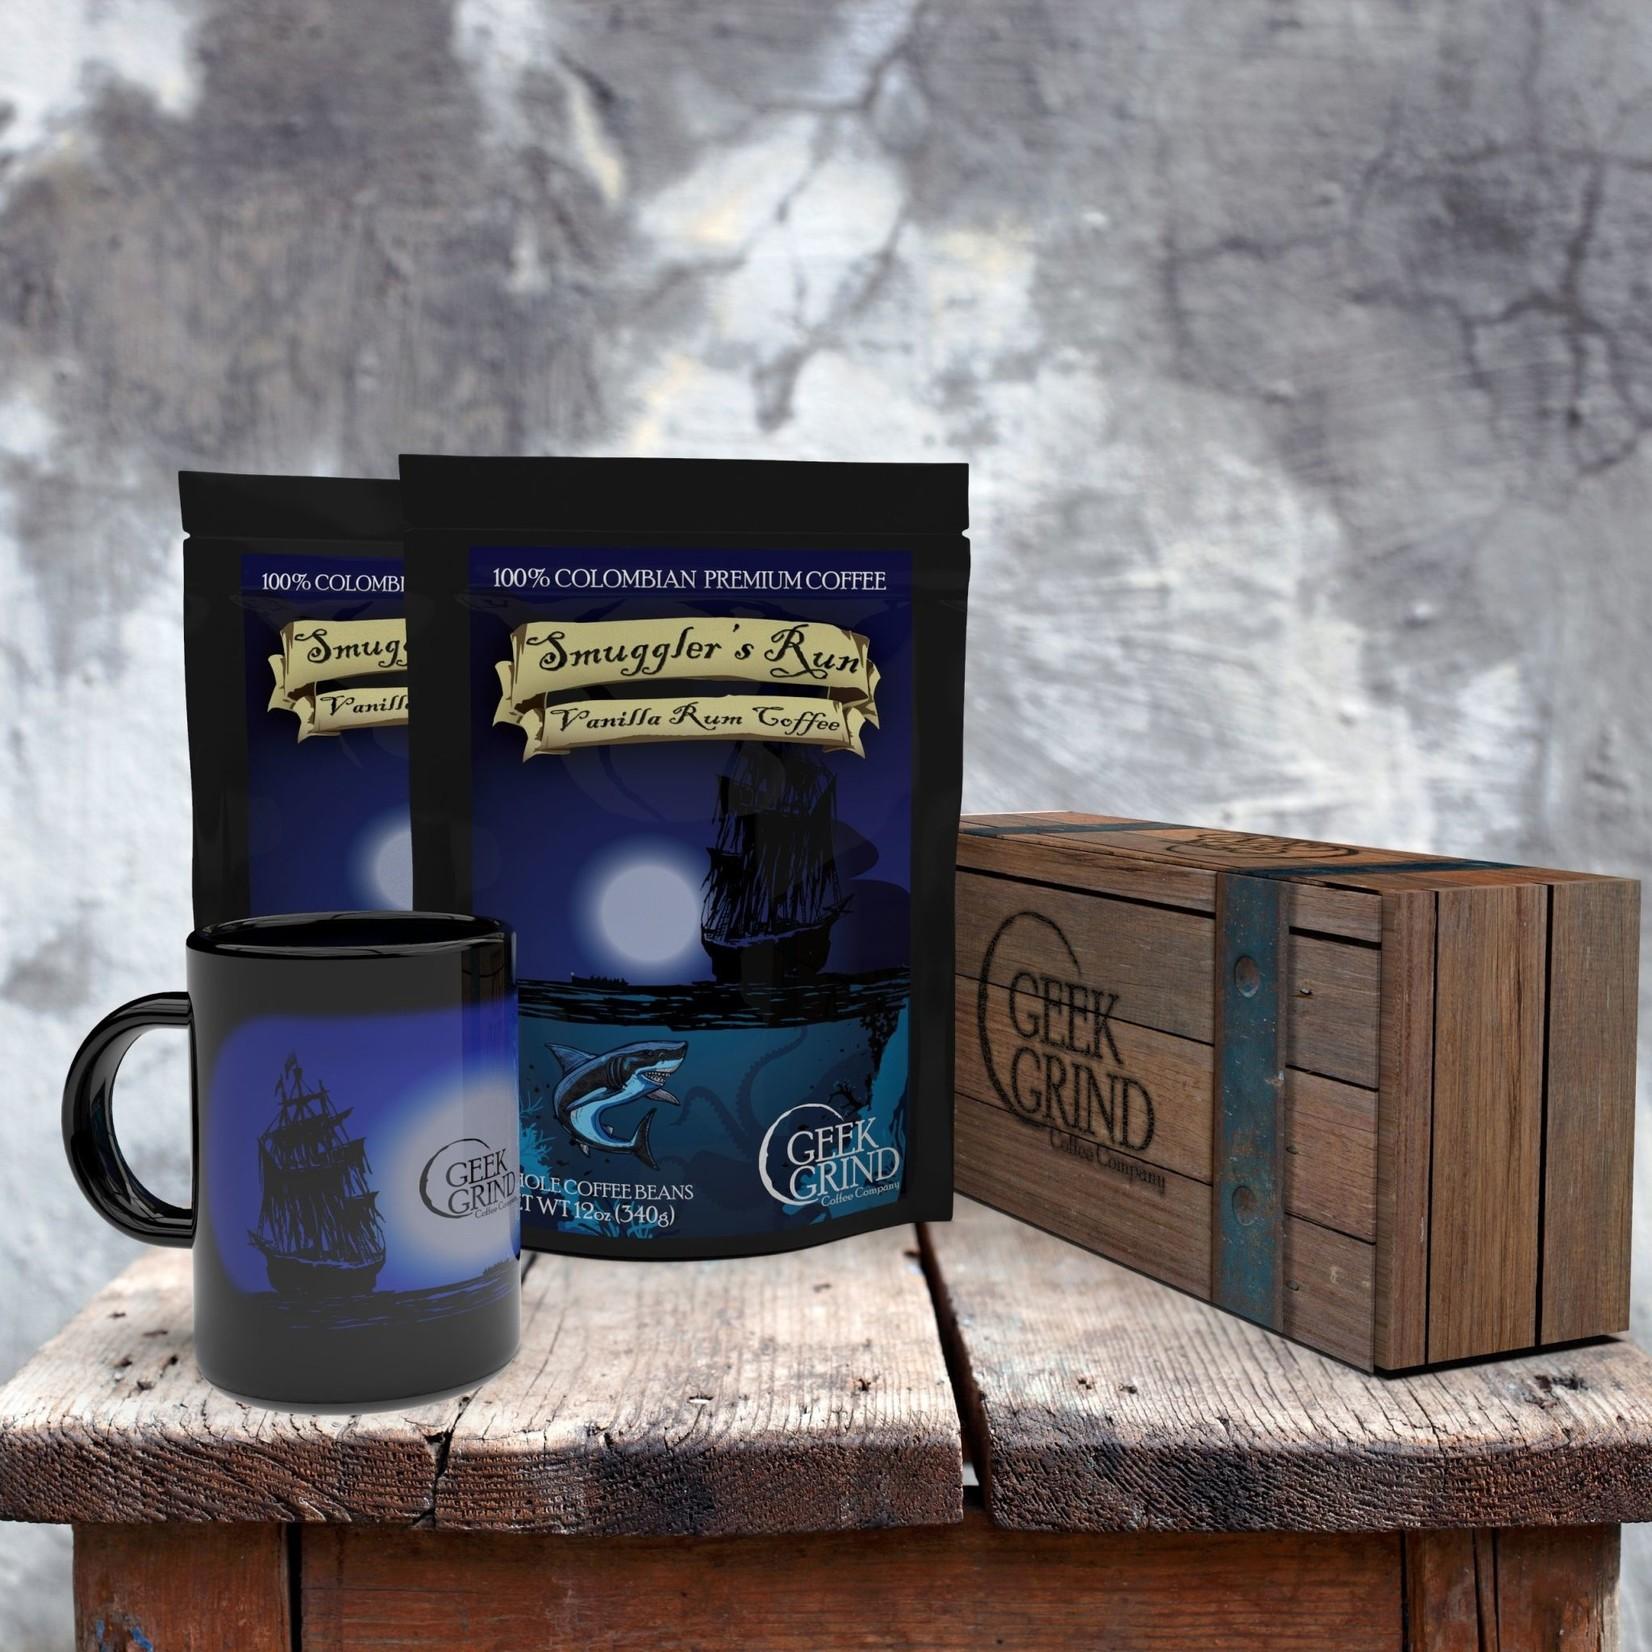 Geek Grind Smuggler's Run & Cup Coffee Gift Crate